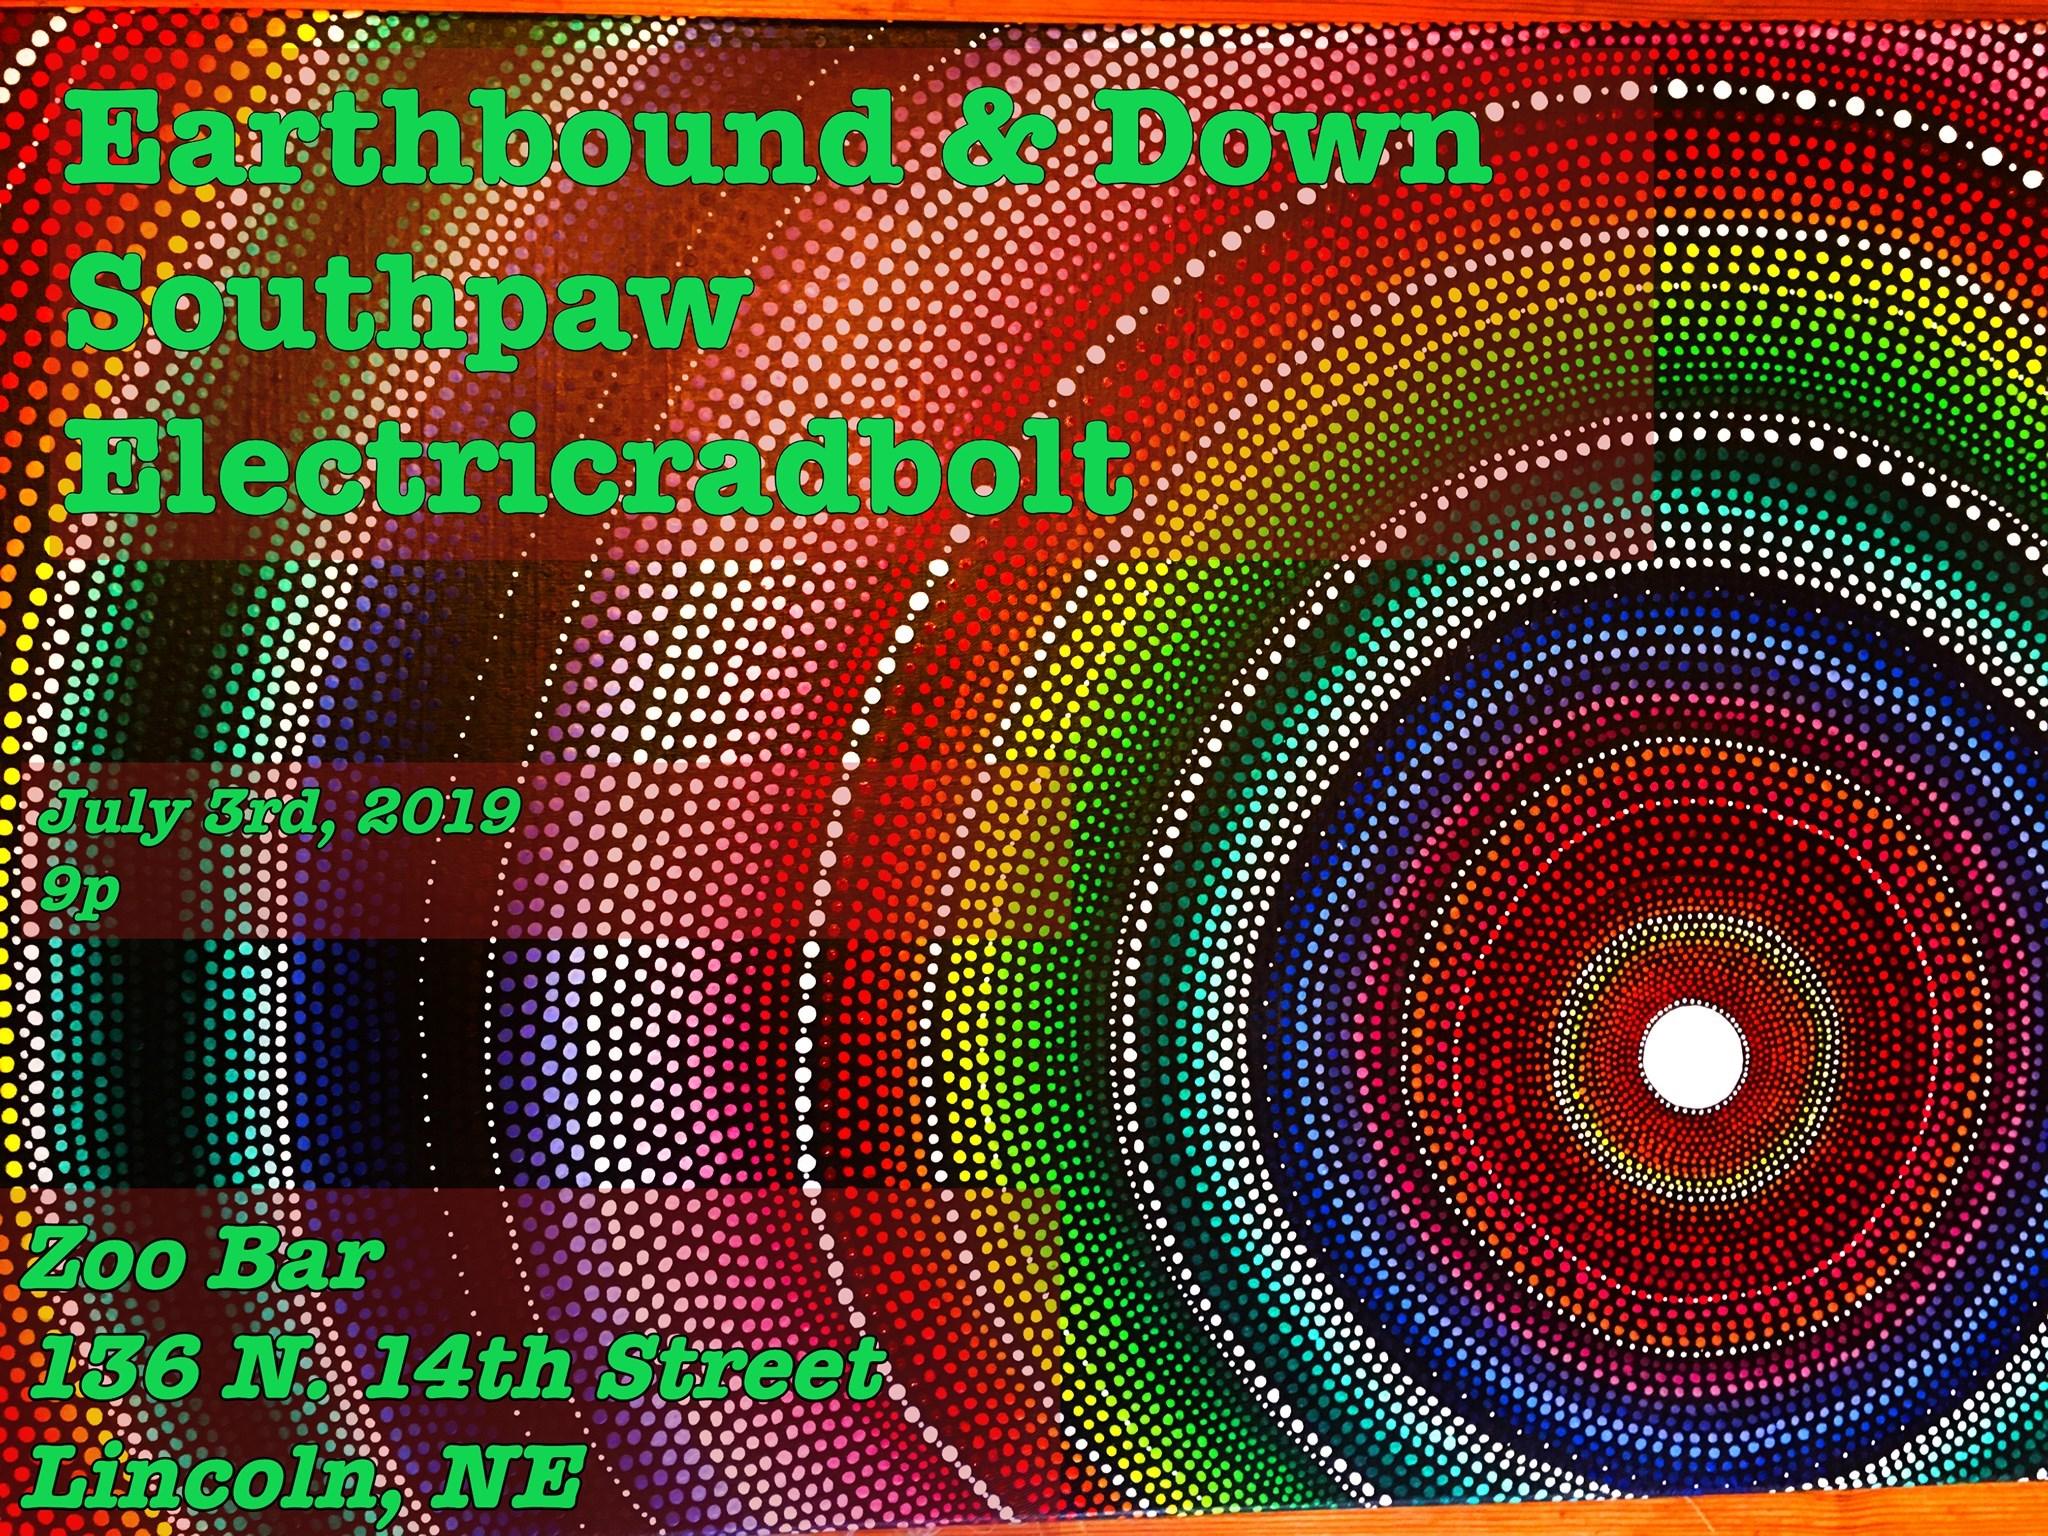 Earthbound & Down / Southpaw / Electricradbolt - KZUM 89 3